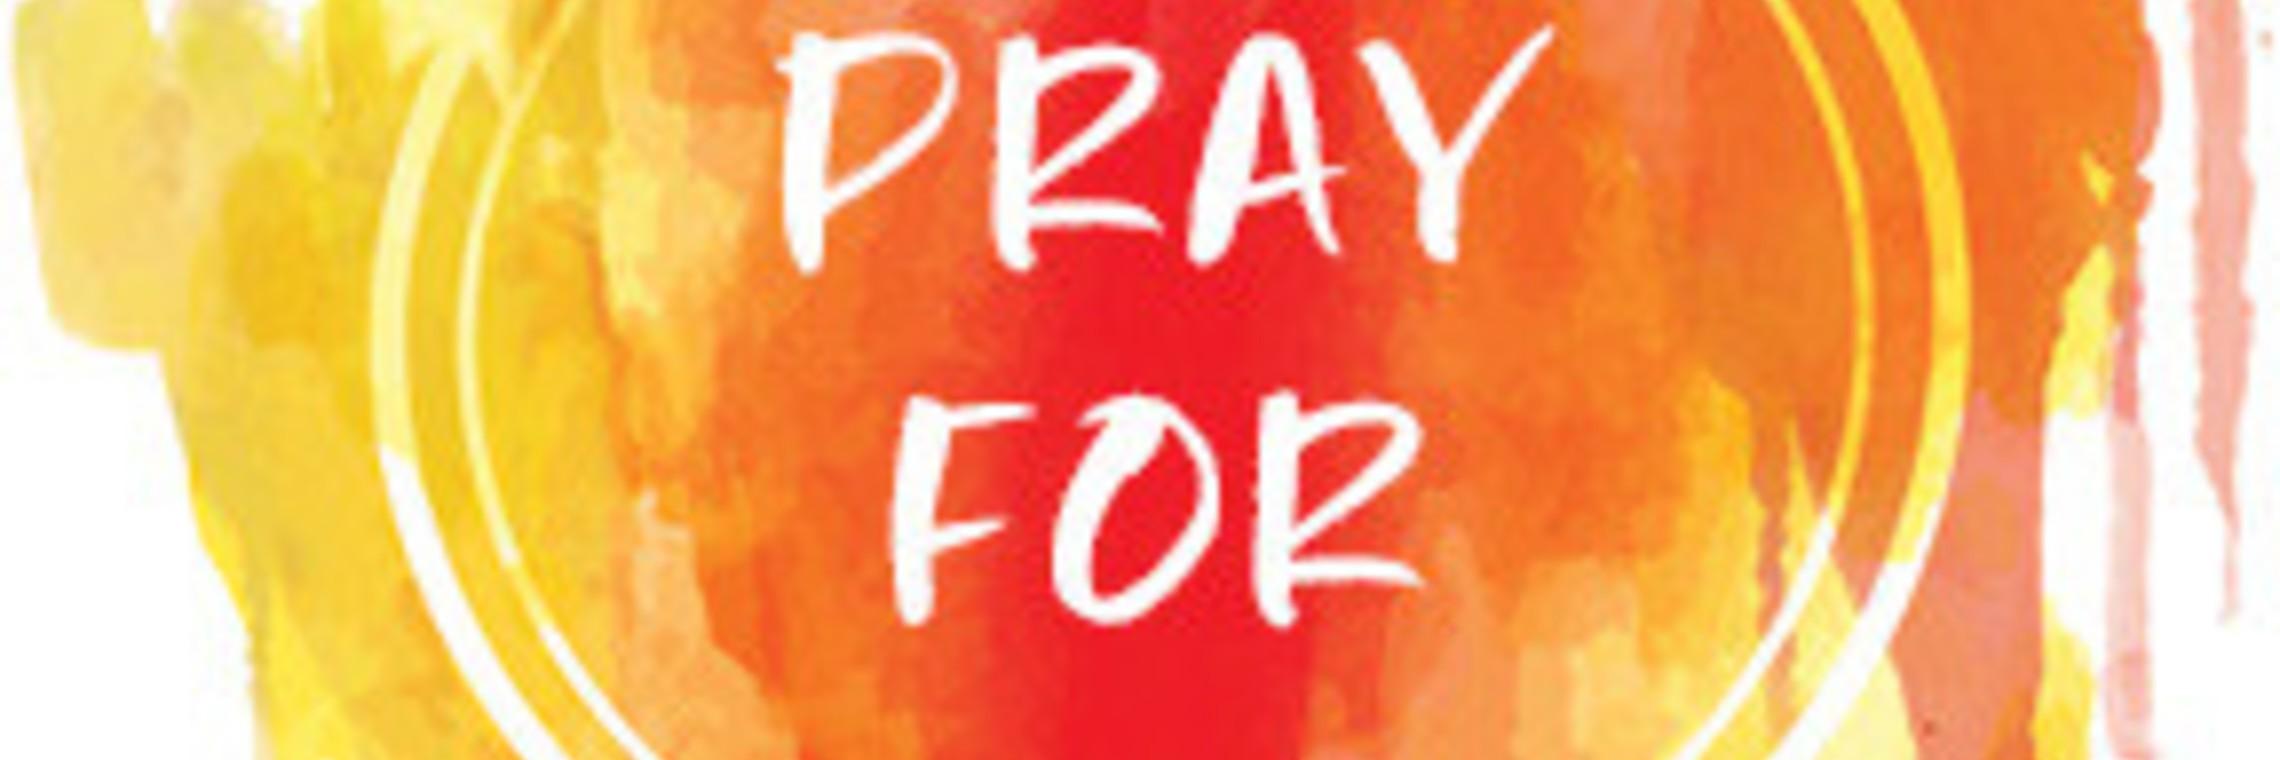 Prayer 4 T 19 4c